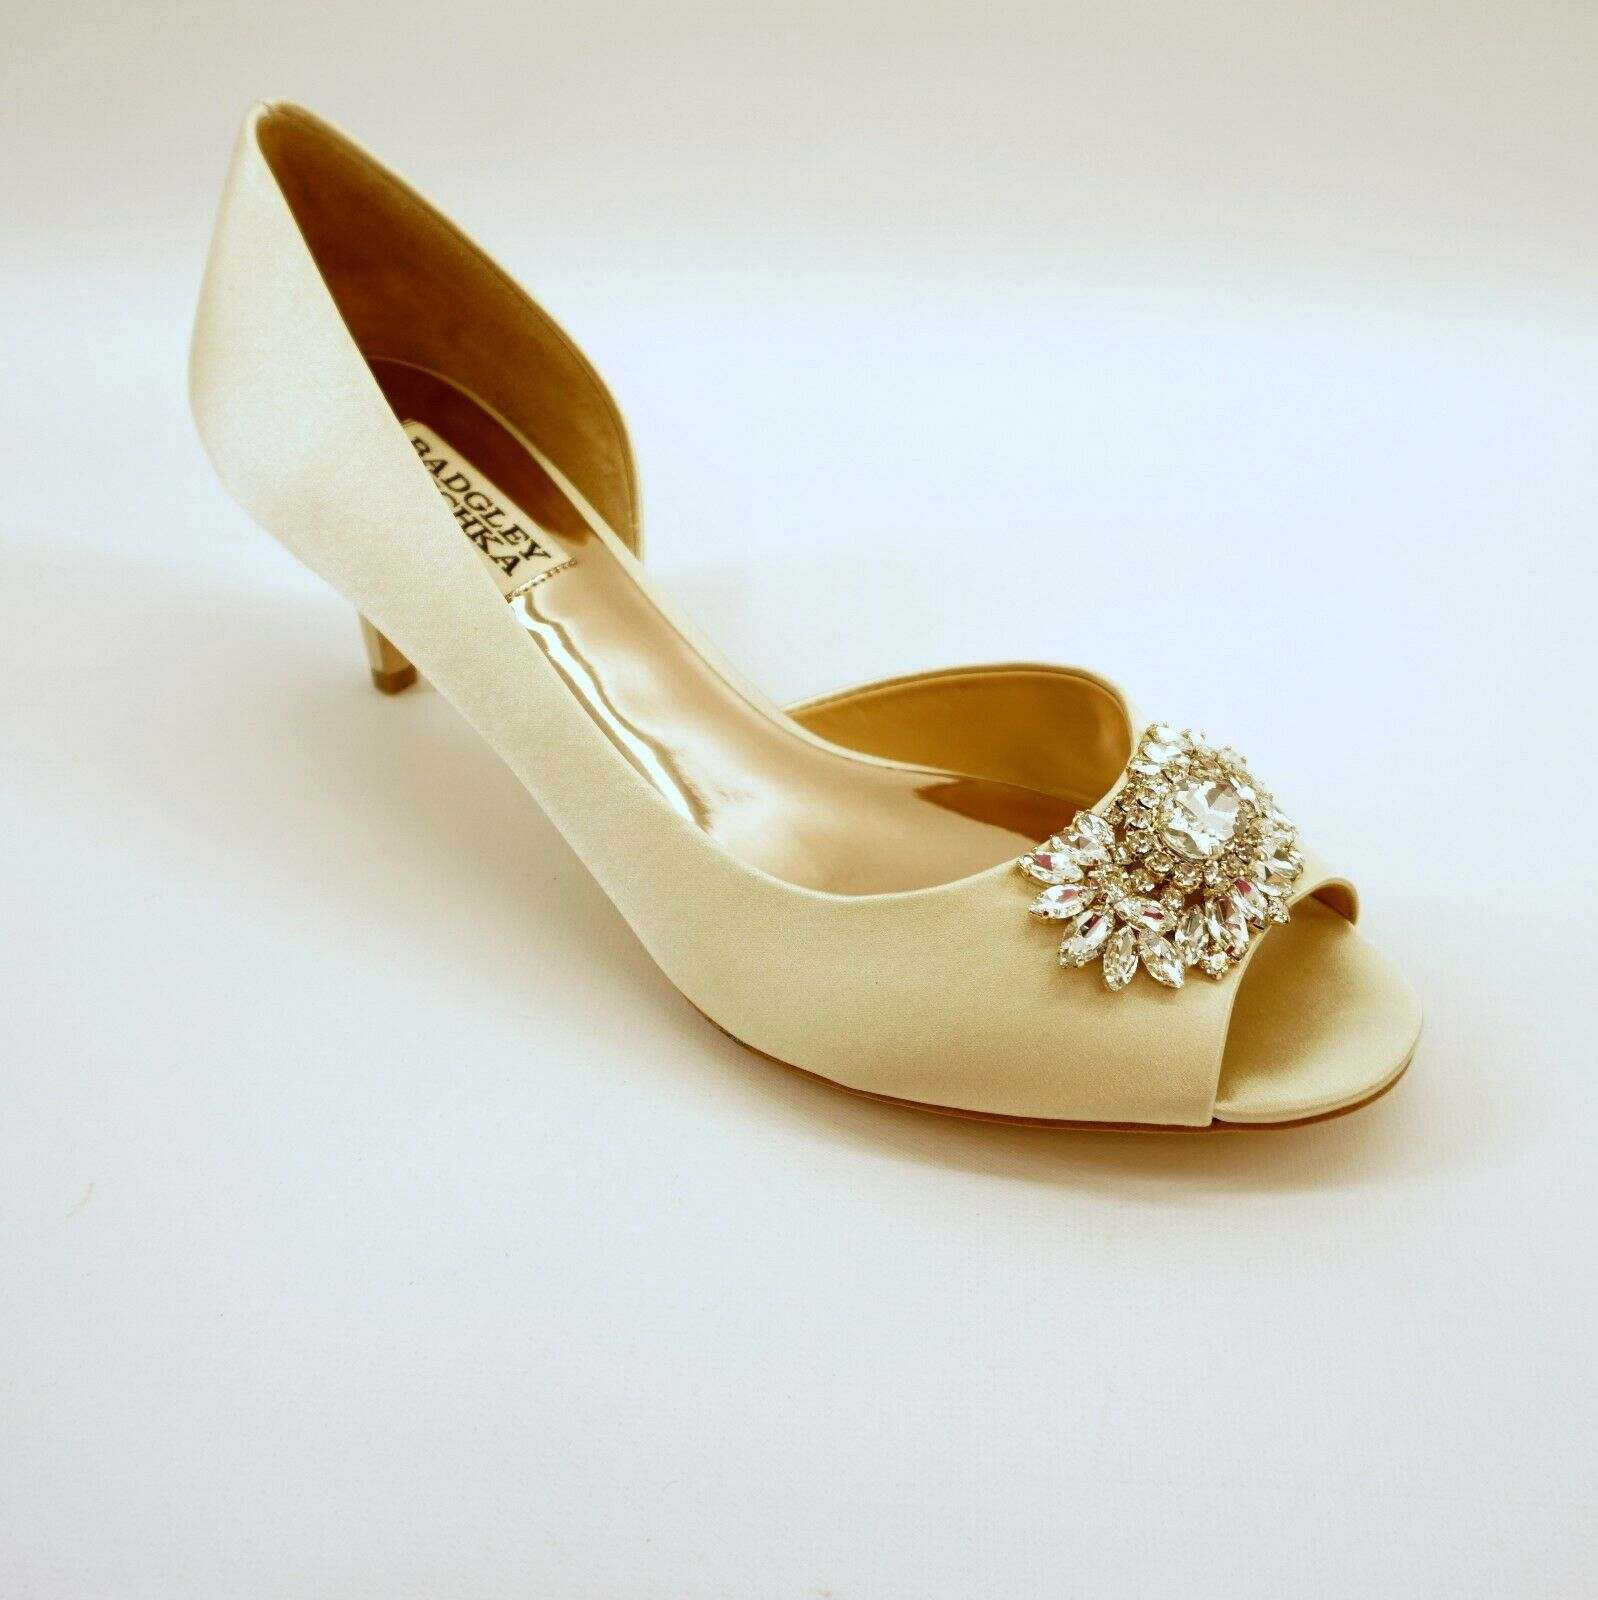 Badgley Mischka Women shoes Macie Open Toe Embellished Mid Heel Ivory 9M  225